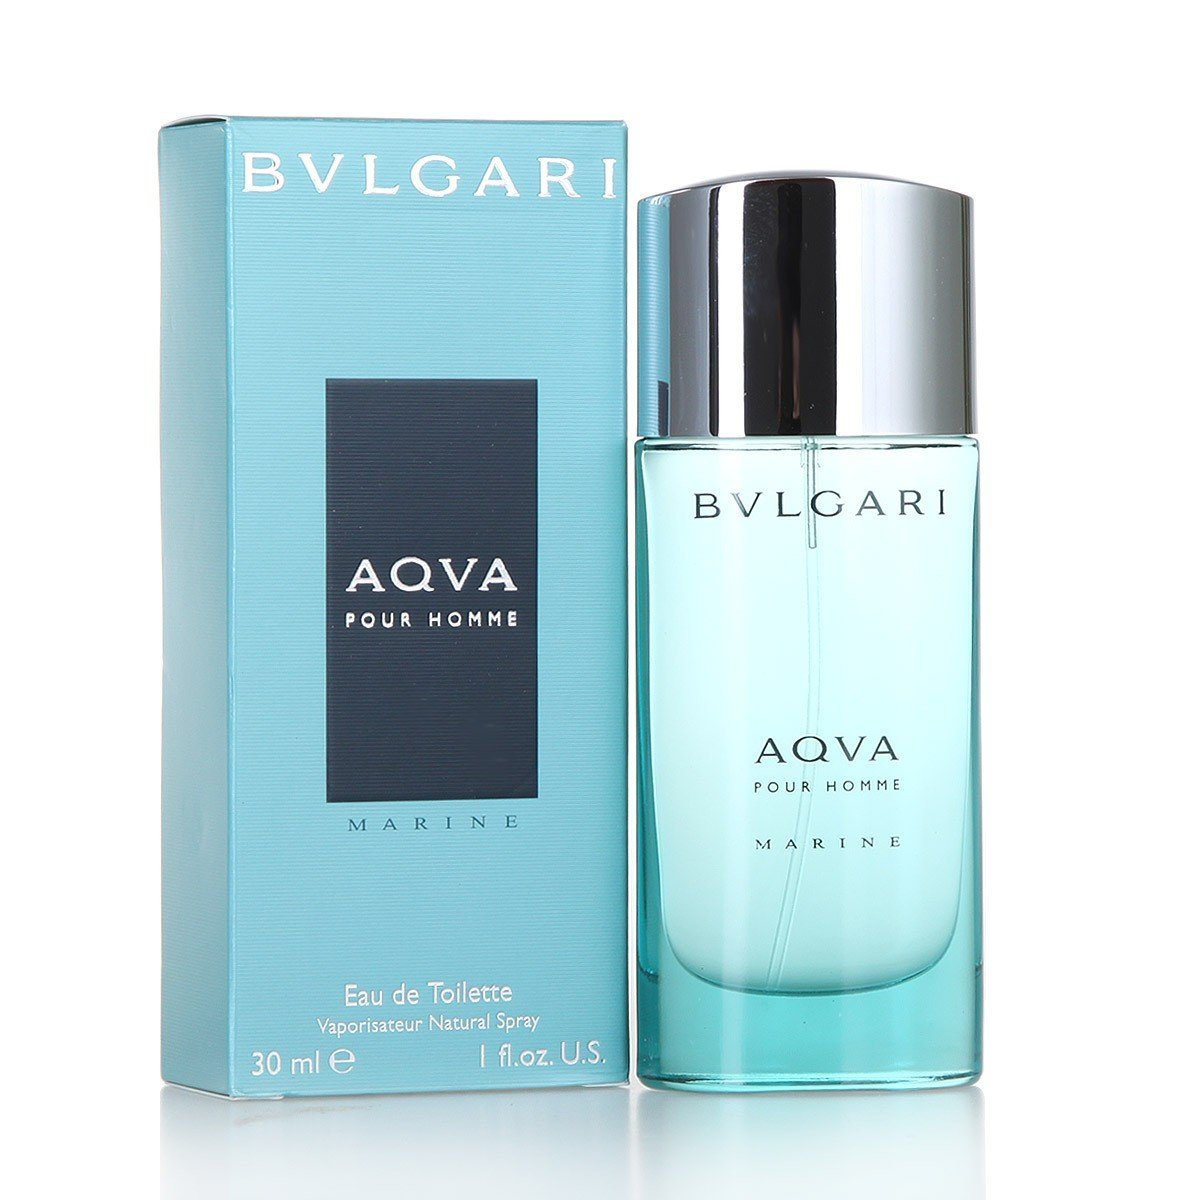 Bvlgari Aqua Marine Eau De Toilette 100 Ml Beauty Blv Blue Men Edt 100ml